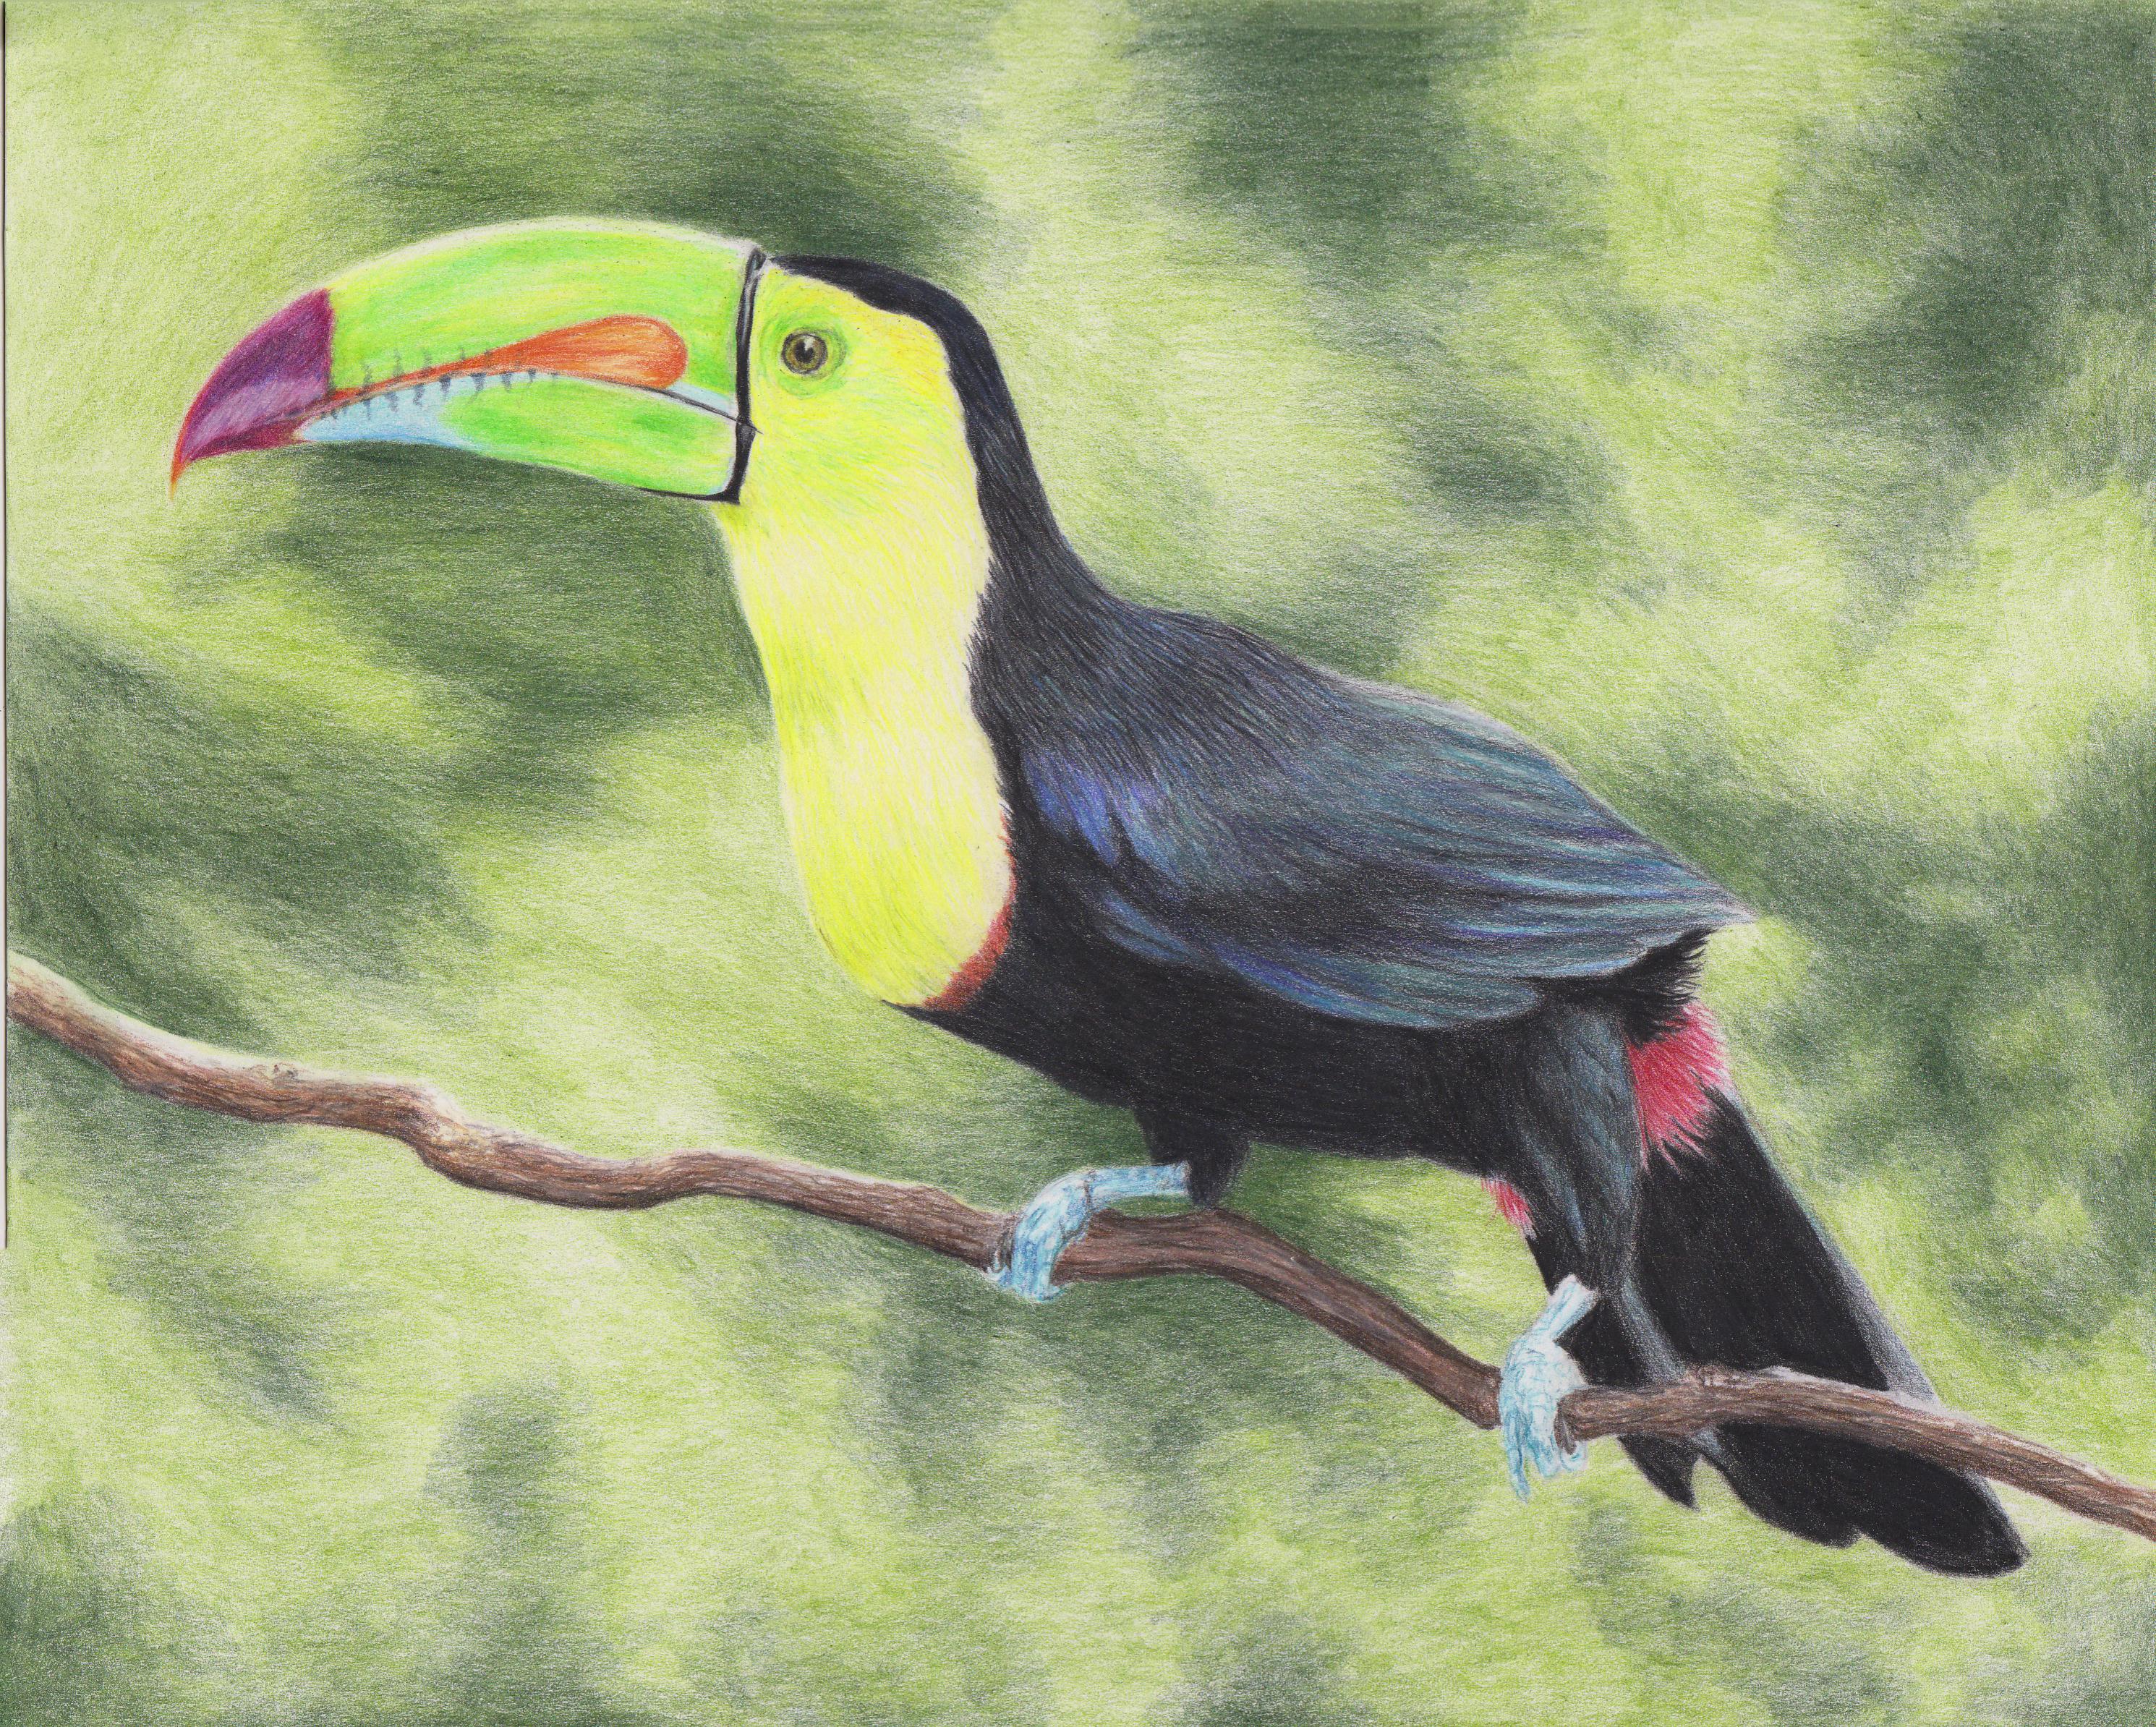 школы тукан птица рисунок халат многое